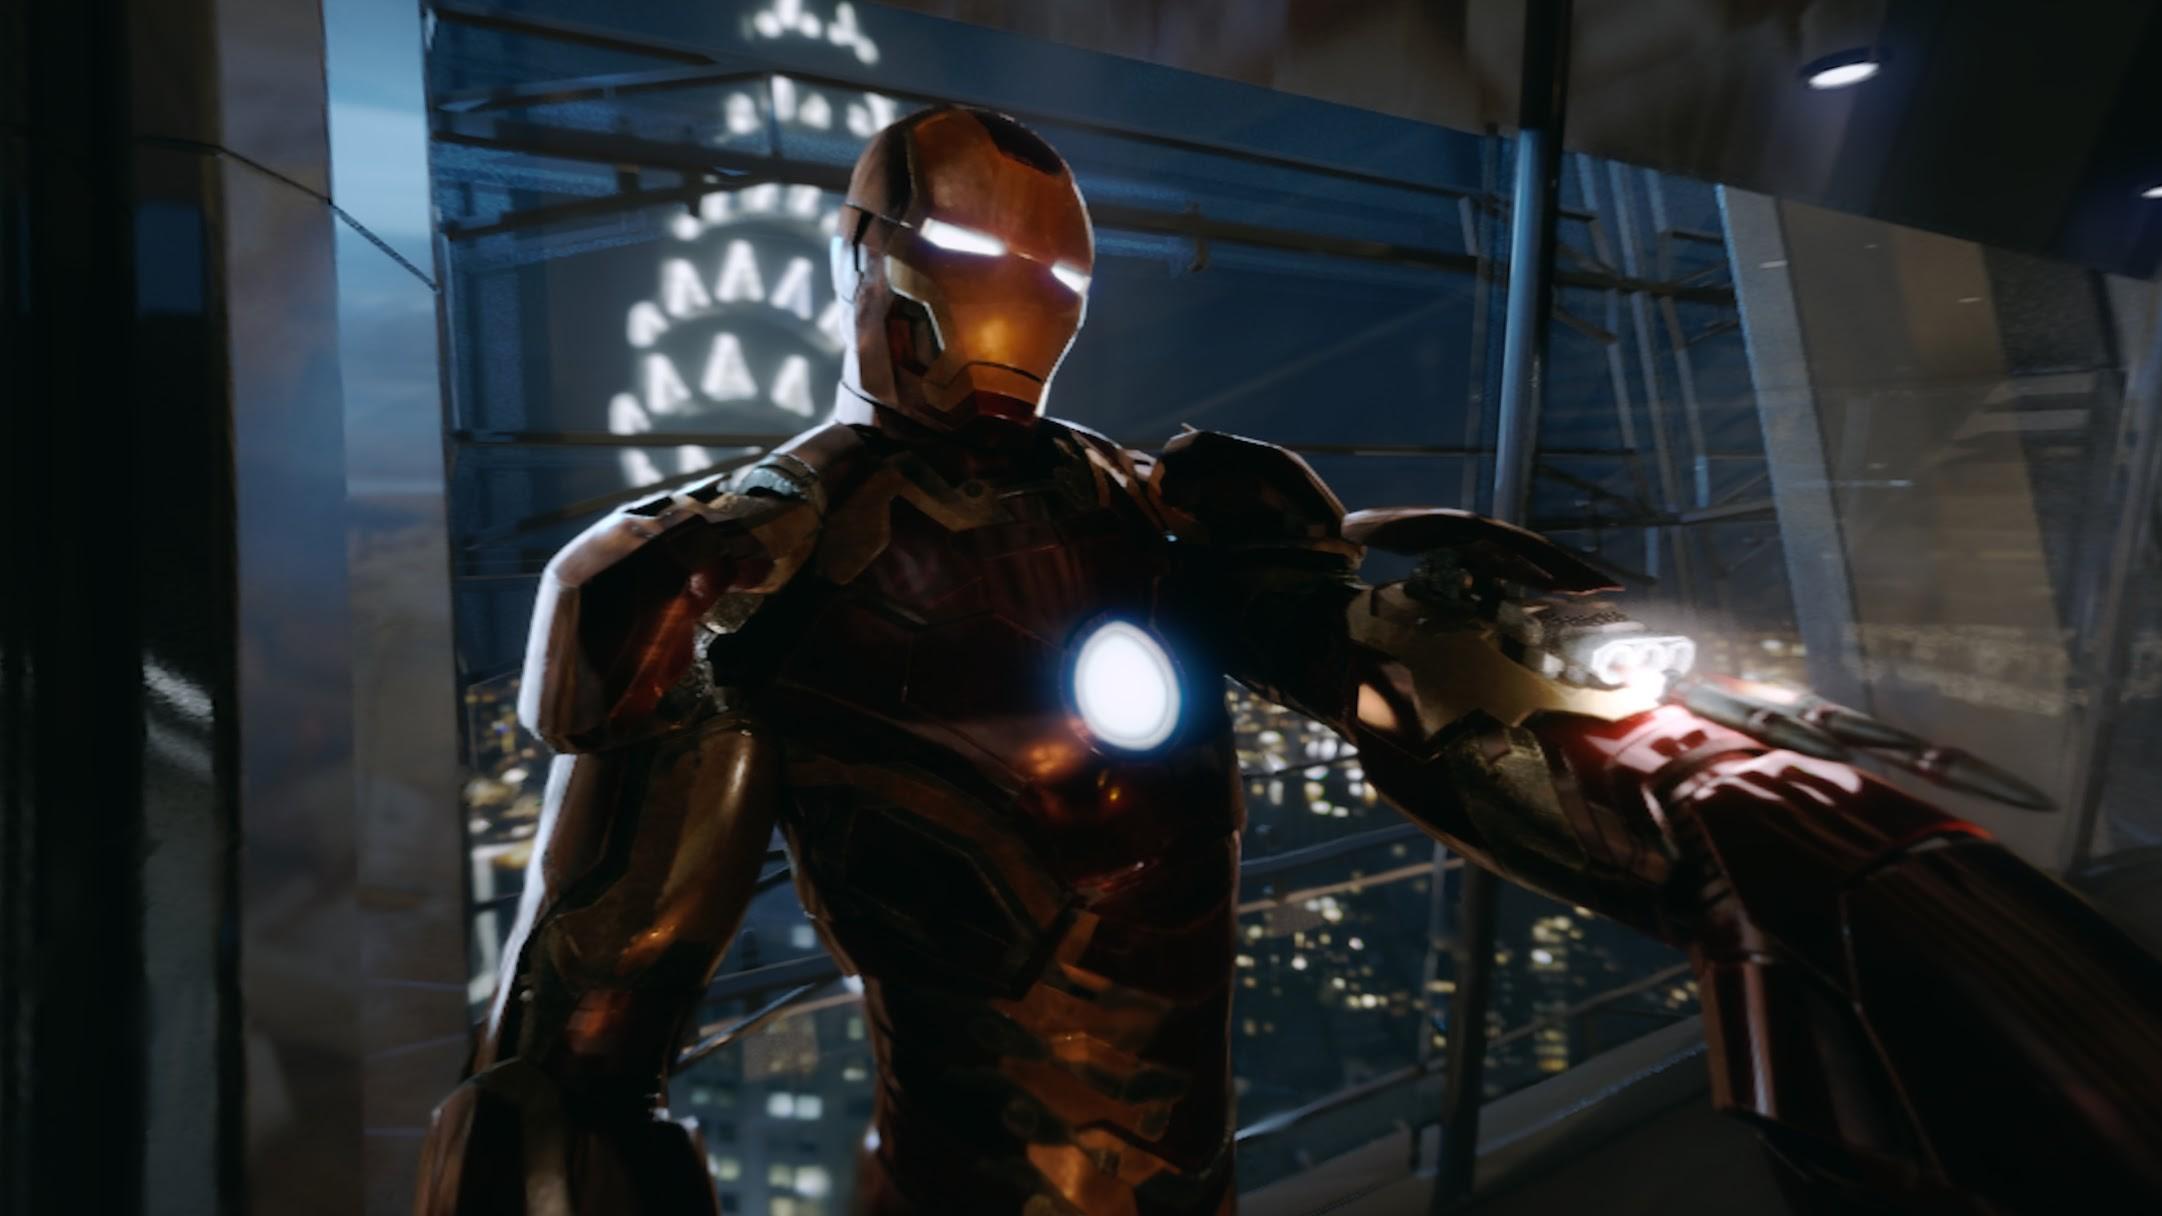 Building The Latest Avengers Age of Ultron Virtual Reality … iron man  marvel avenger4k – photo #19. Iron Man 4K Wallpaper – WallpaperSafari